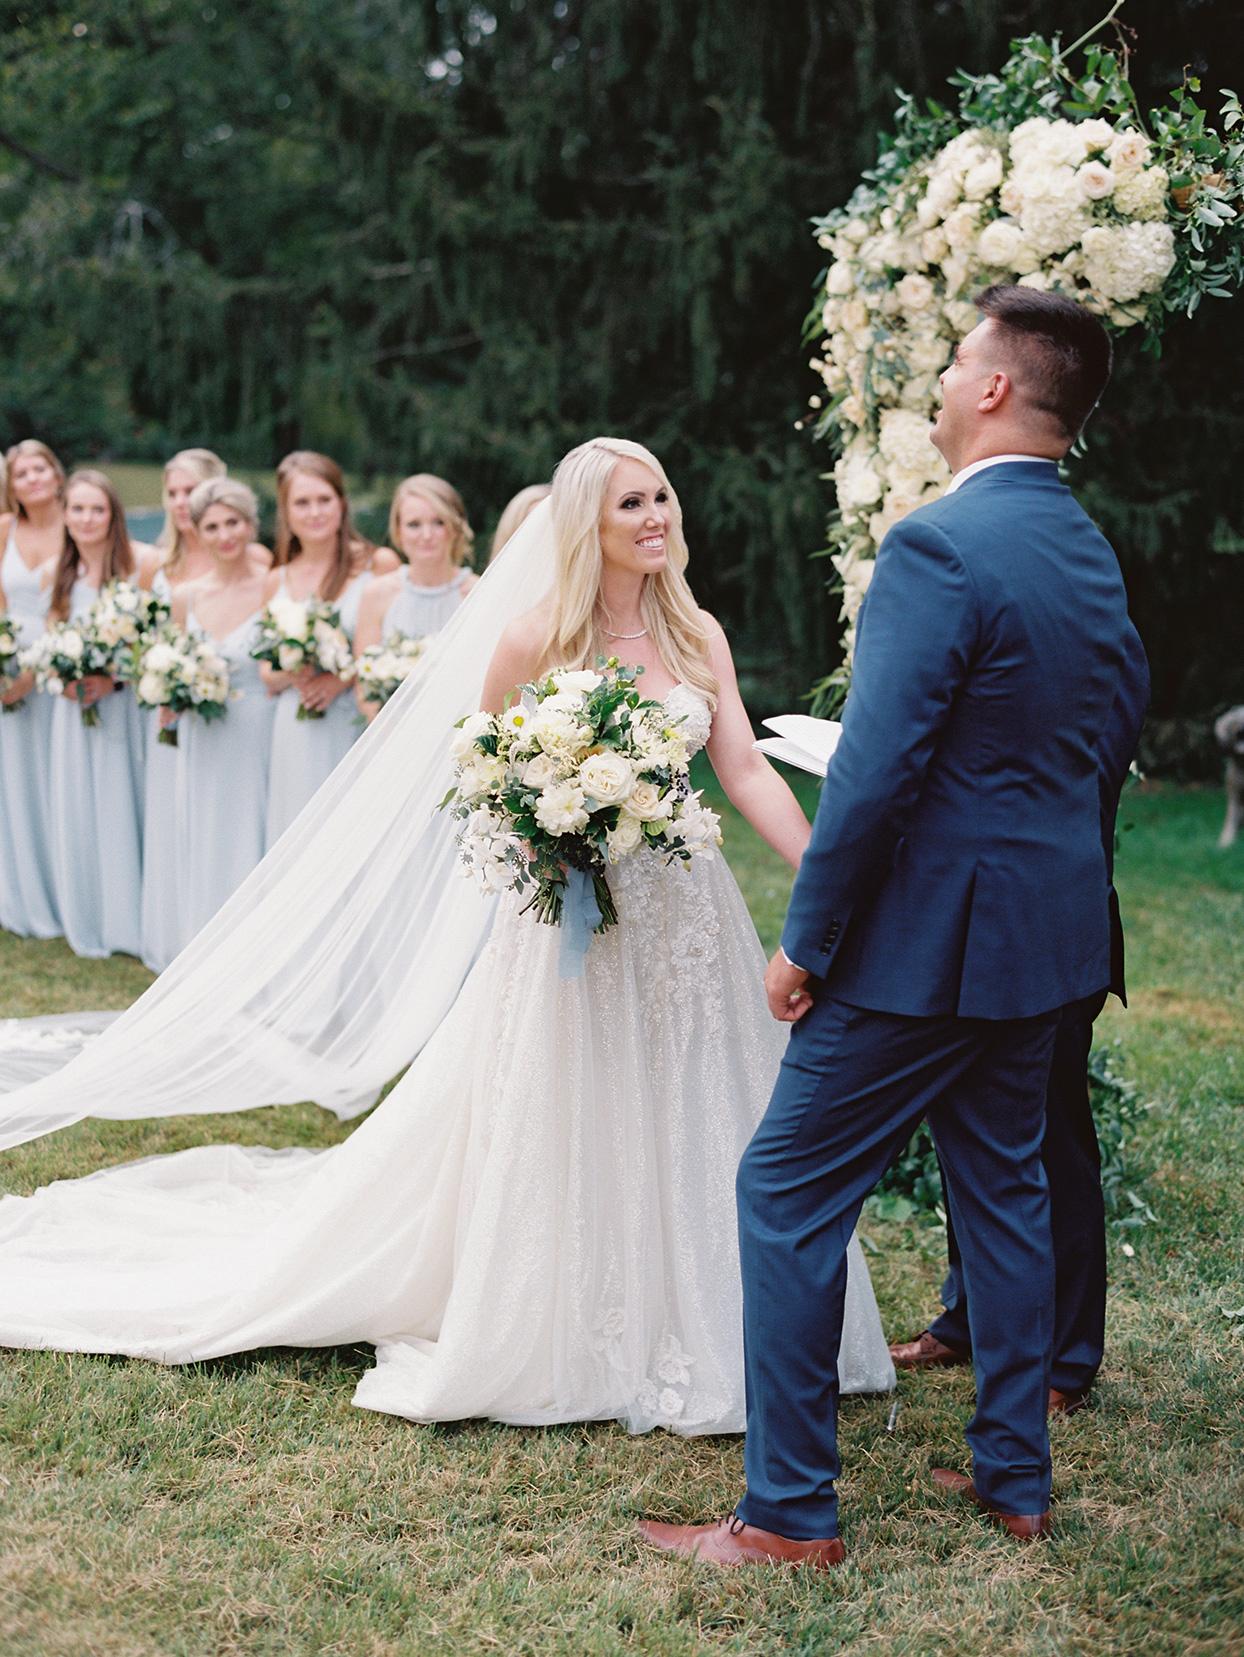 lauren chris wedding ceremony couple saying vows